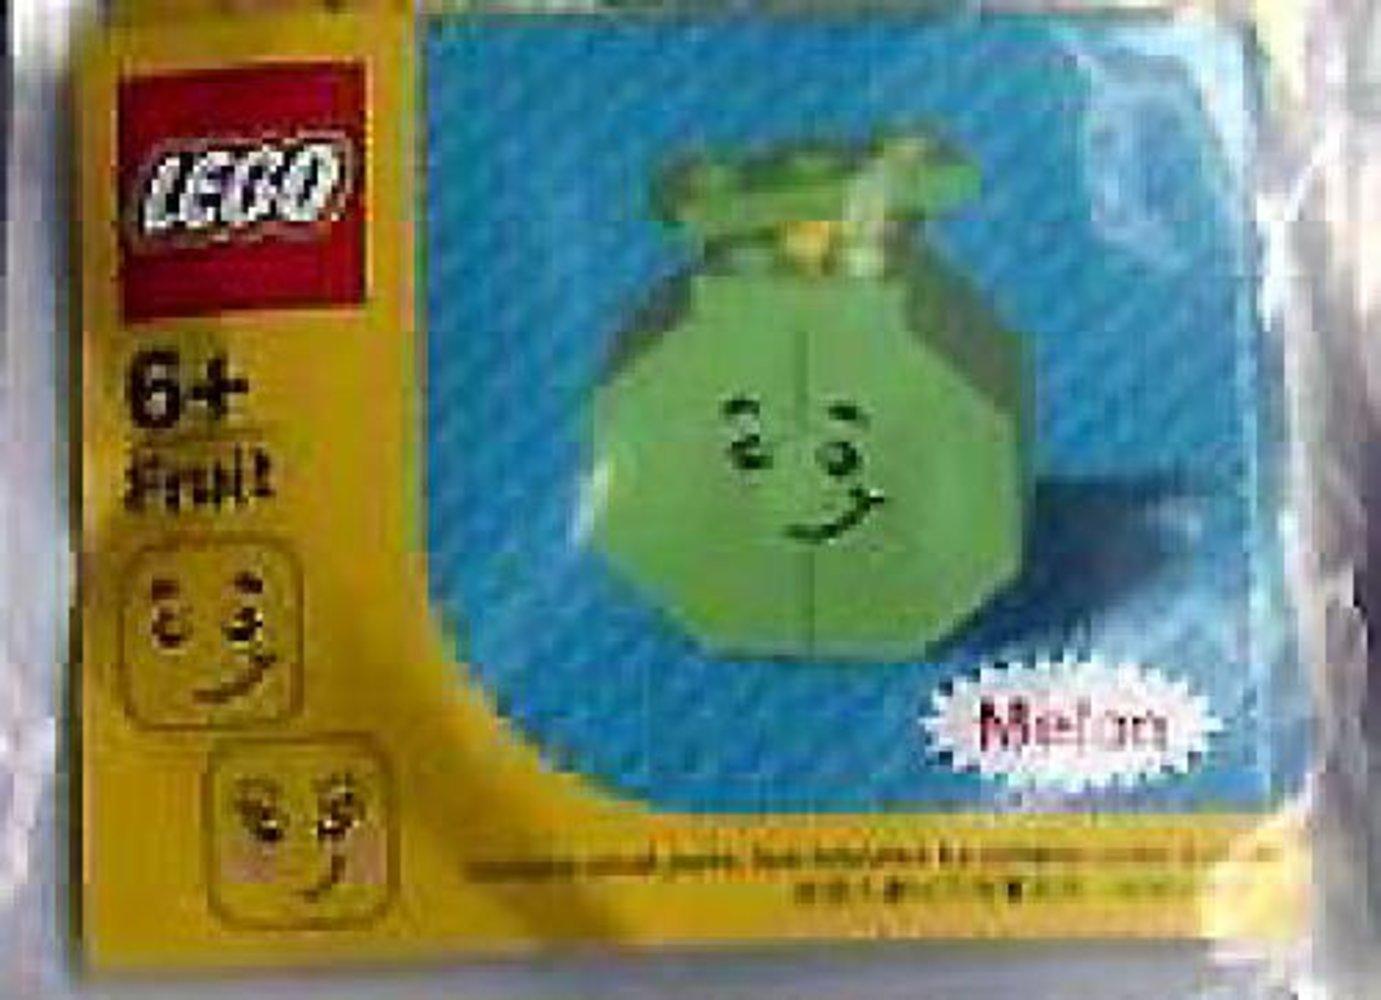 Melon - Hong Kong Lego Show Promotional